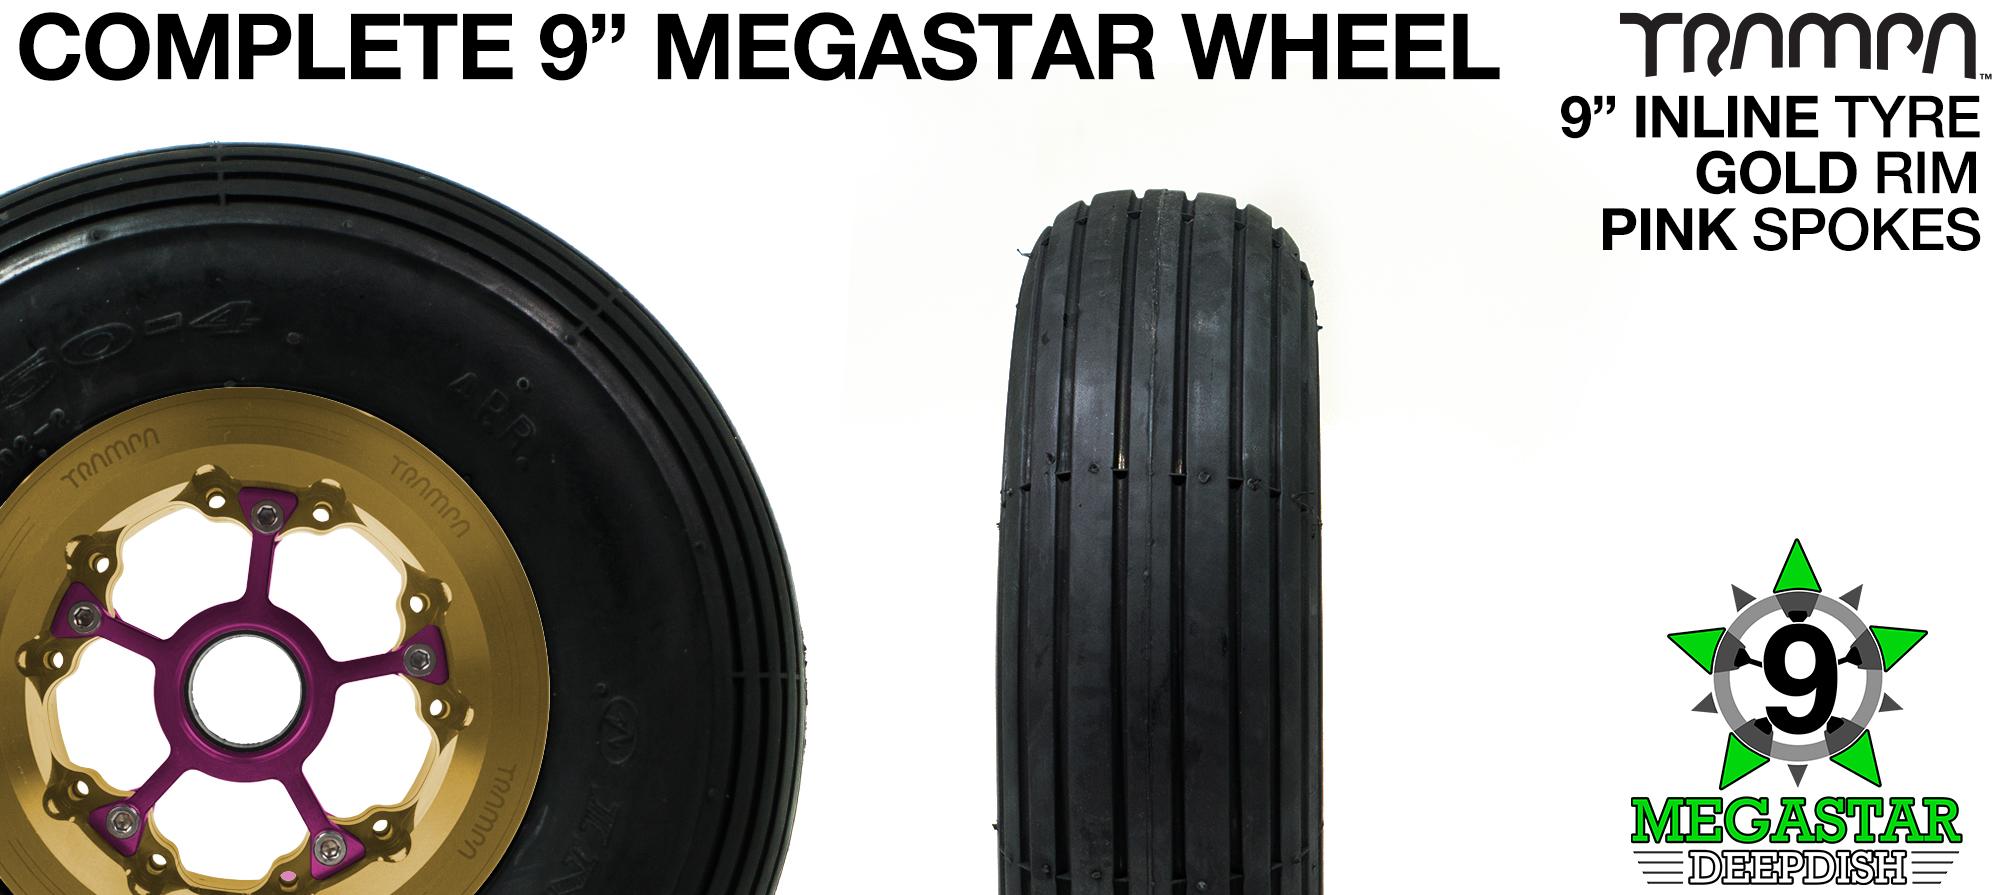 GOLD 9 inch Deep-Dish MEGASTARS Rim with PINK Spokes & 9 Inch INNOVA INLINE Tyre